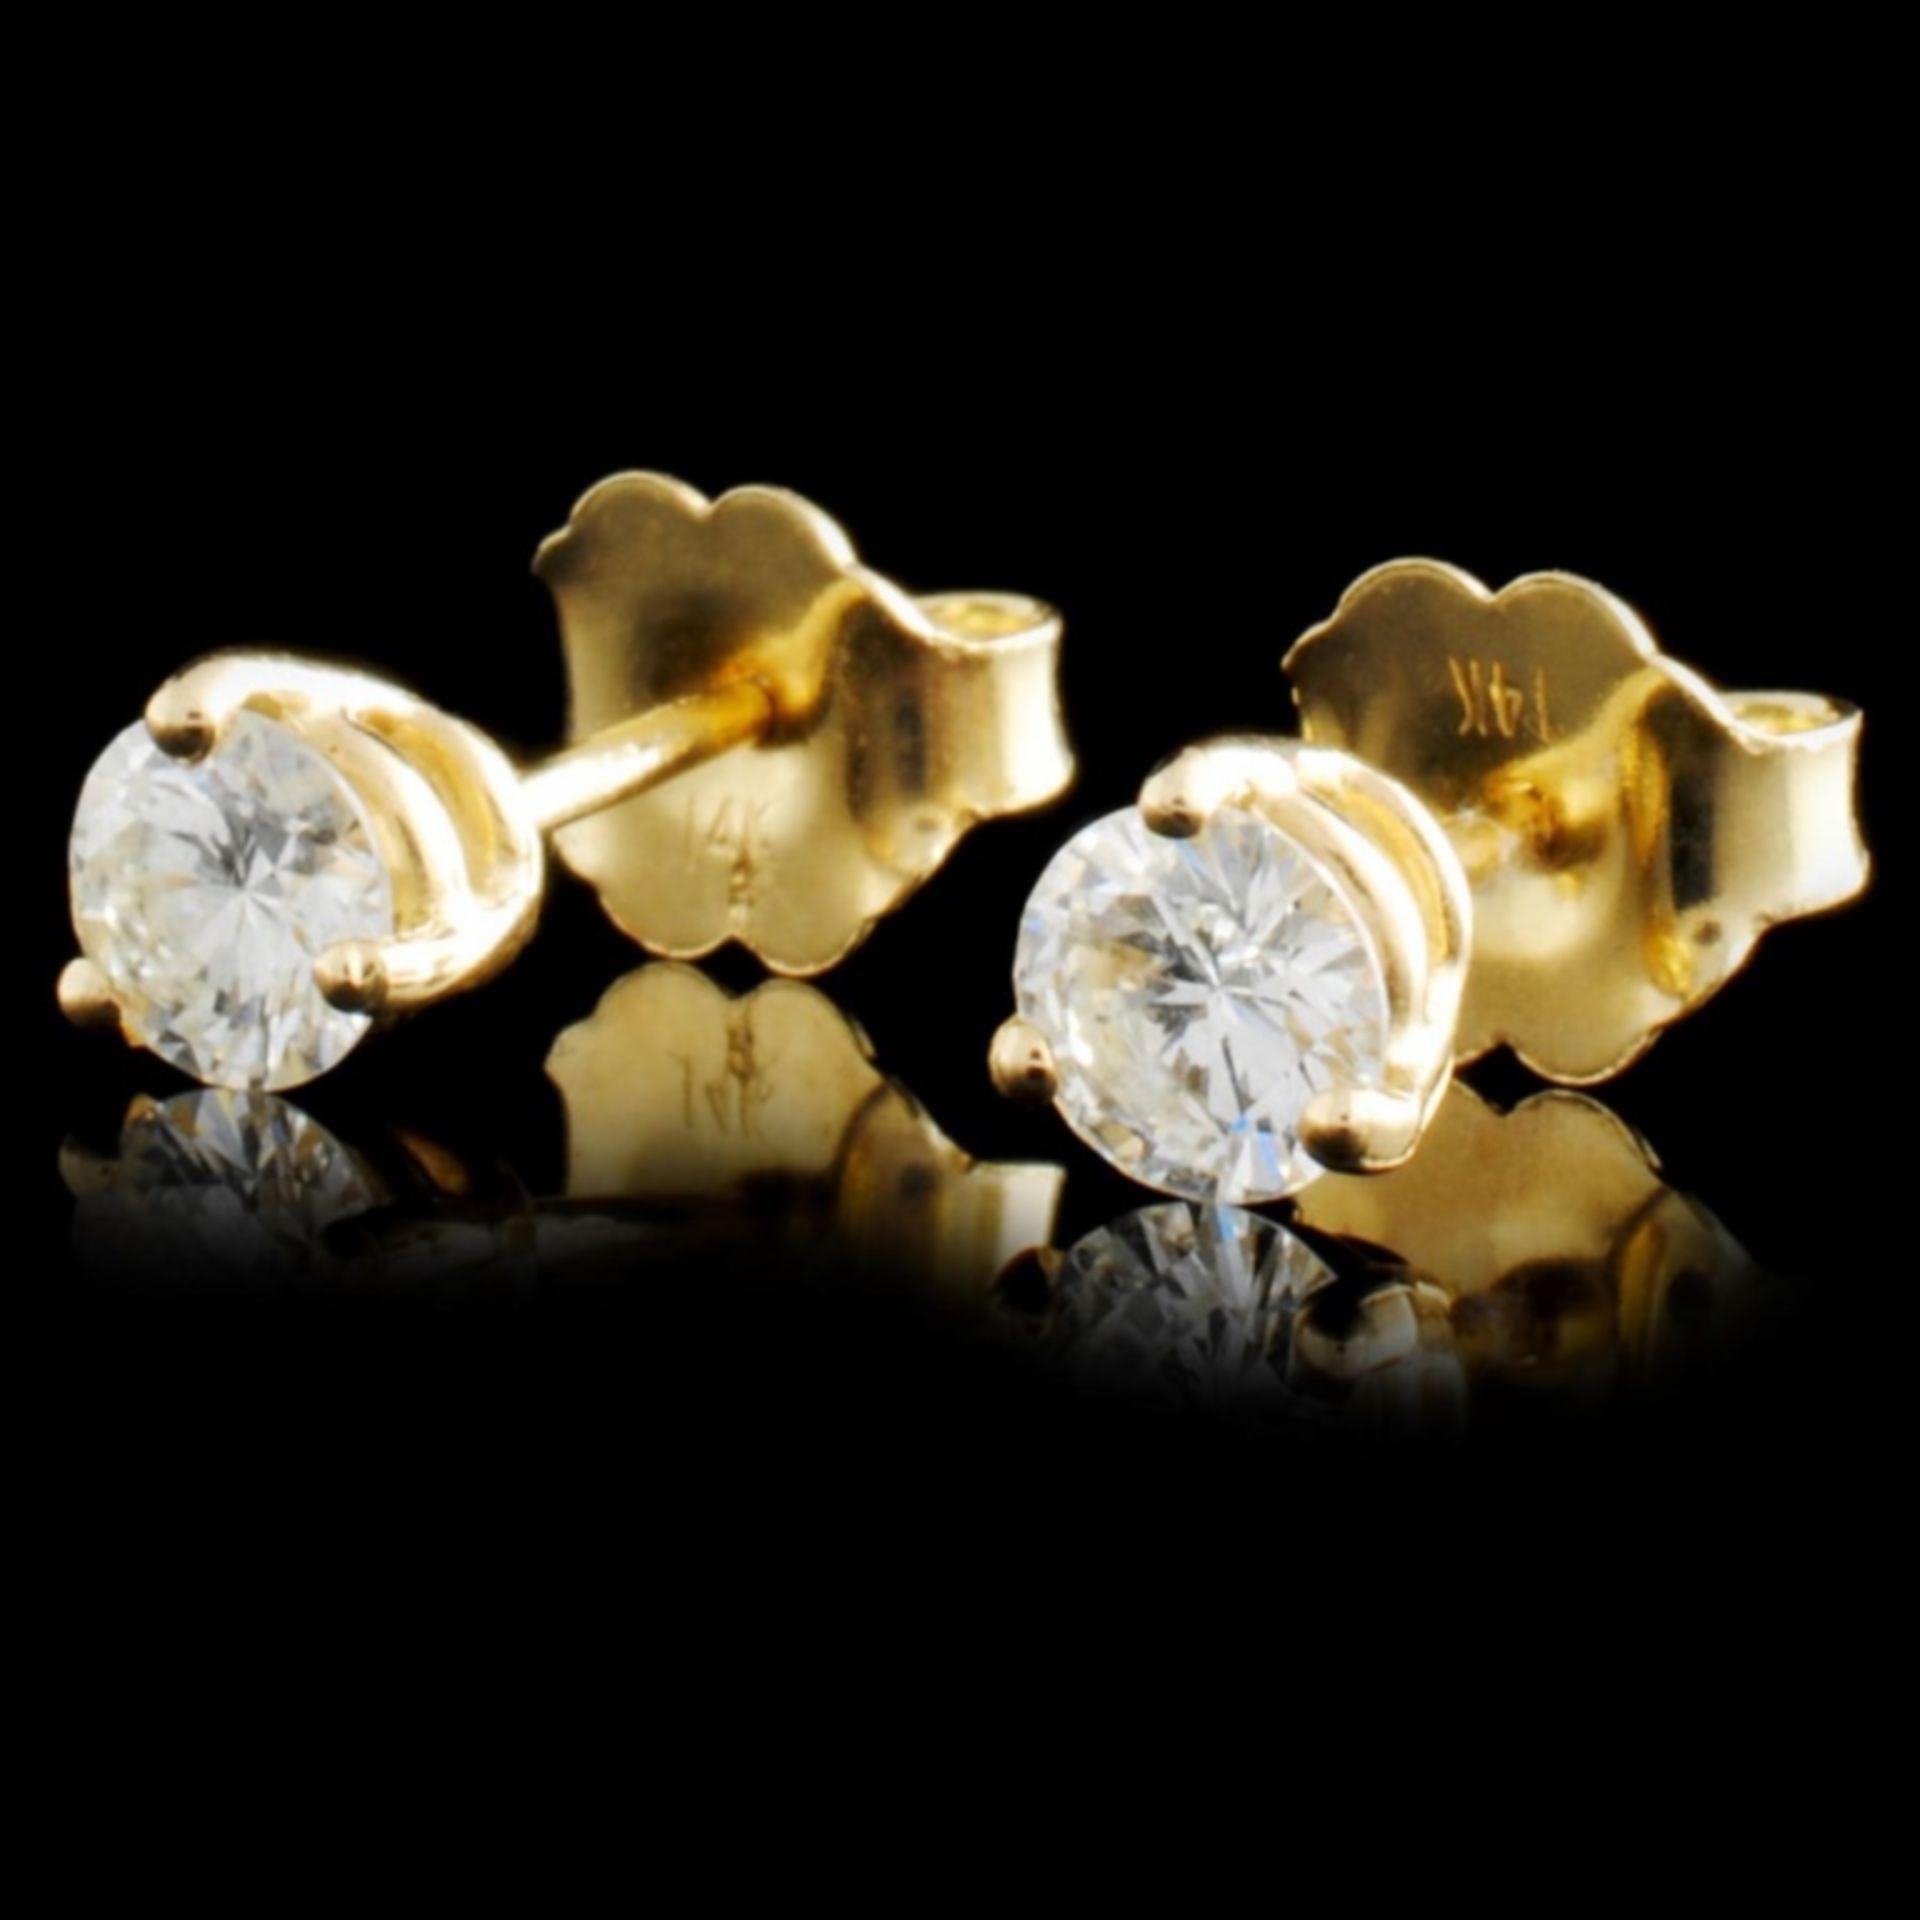 14K Gold 0.46ctw Diamond Earrings - Image 2 of 3